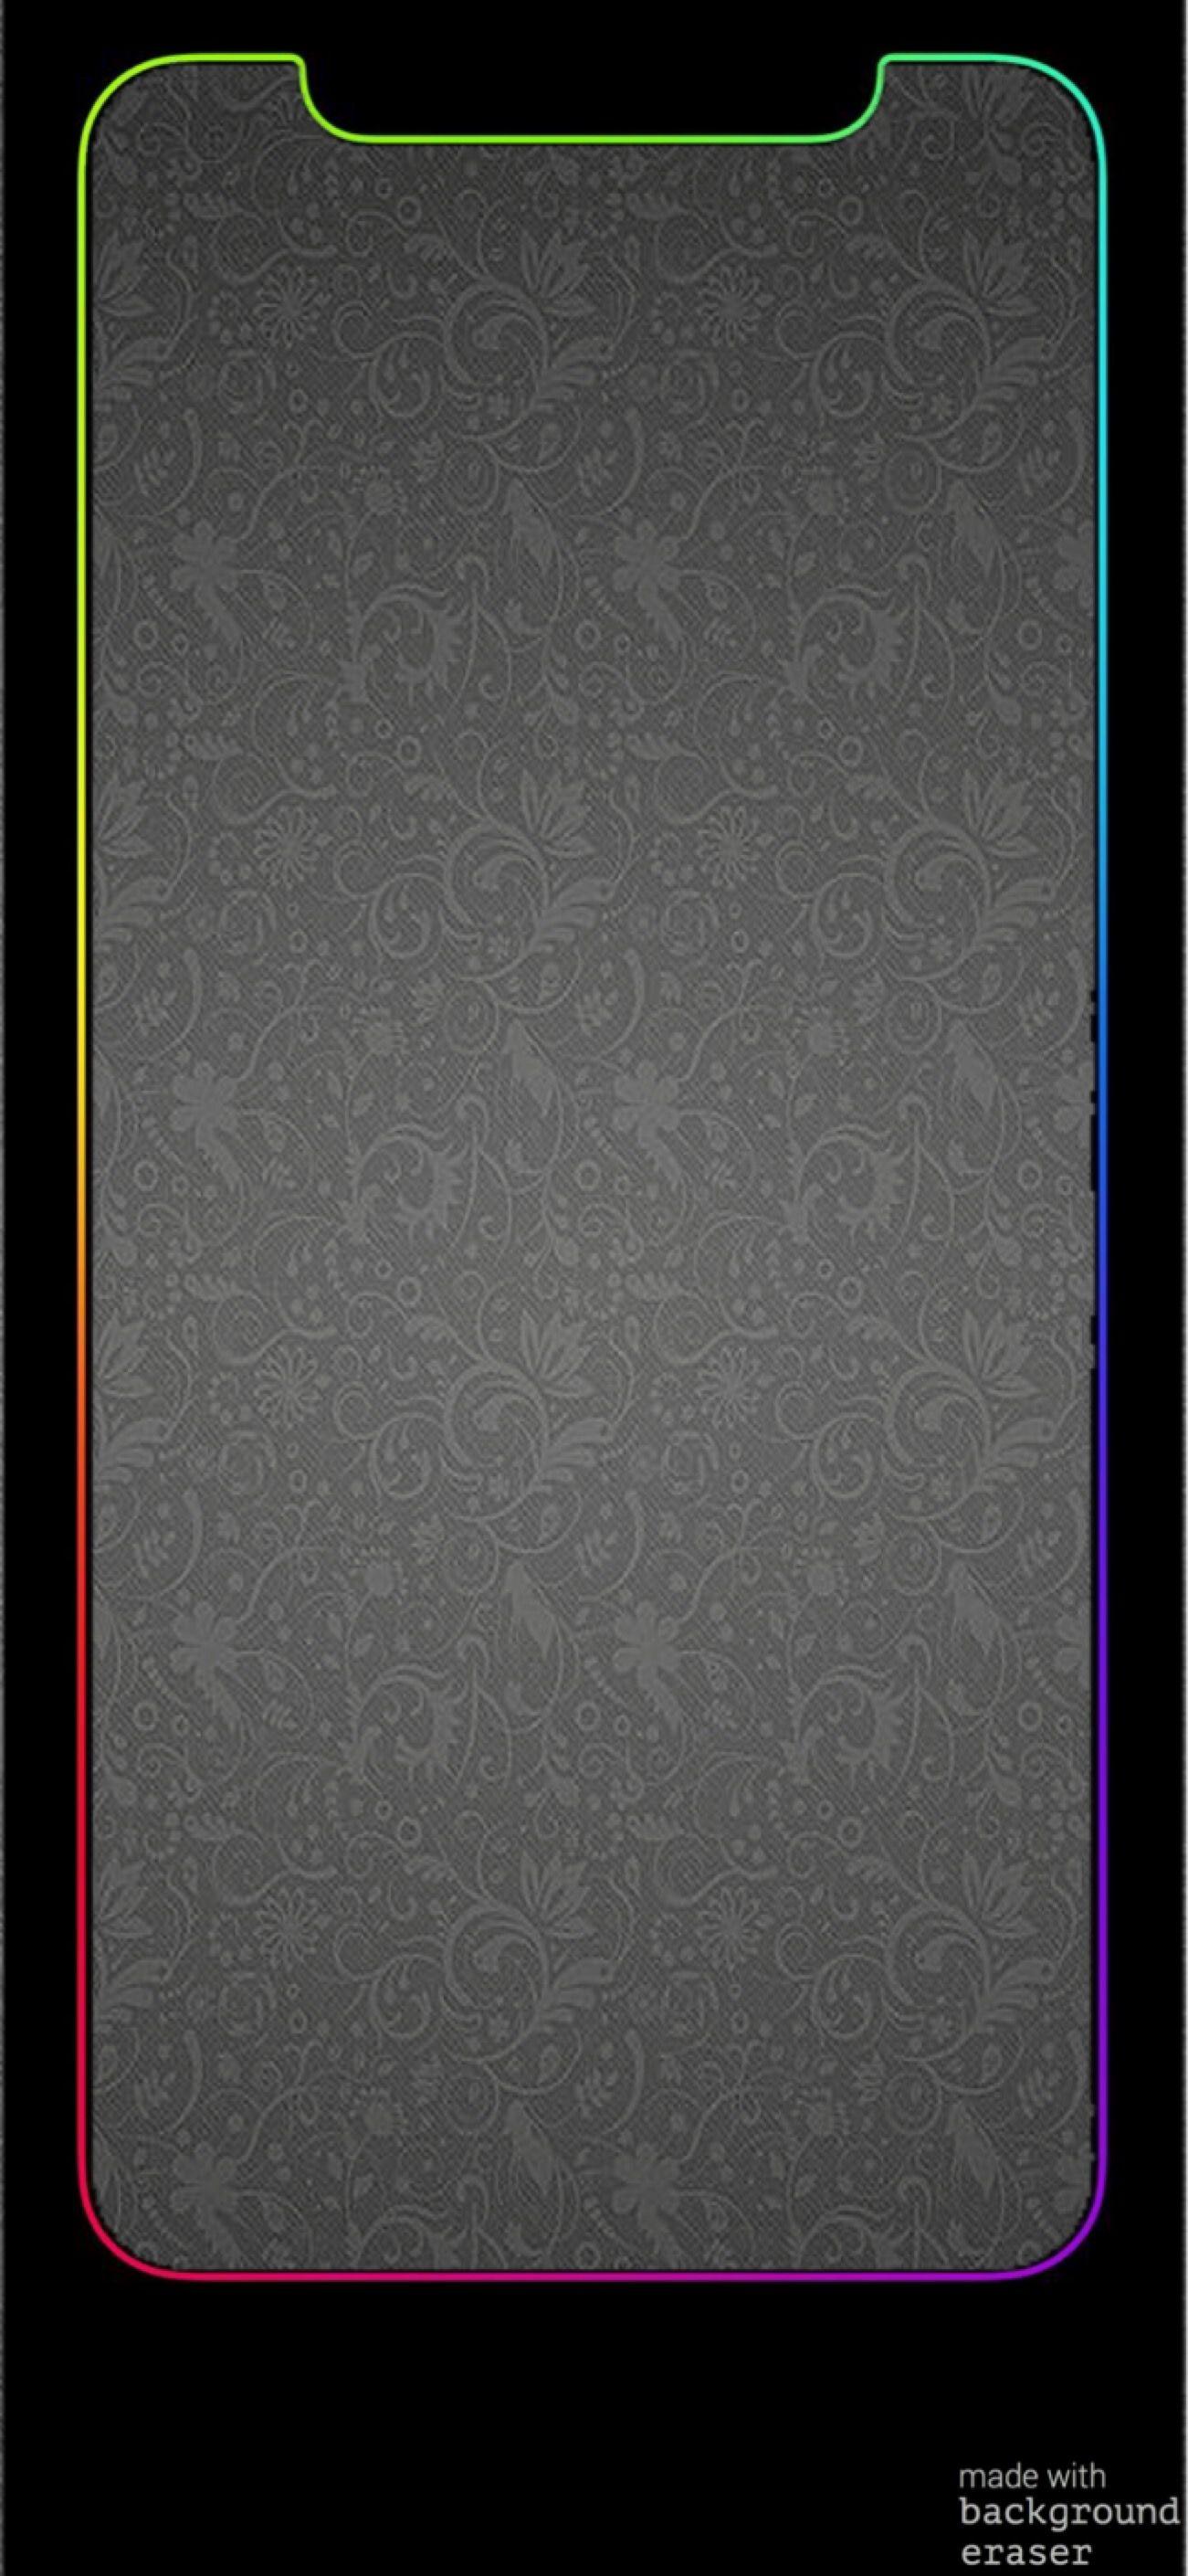 Pin By Maxim Altuxov On Iphone X Iphone Wallpaper App Abstract Iphone Wallpaper Pretty Wallpaper Iphone